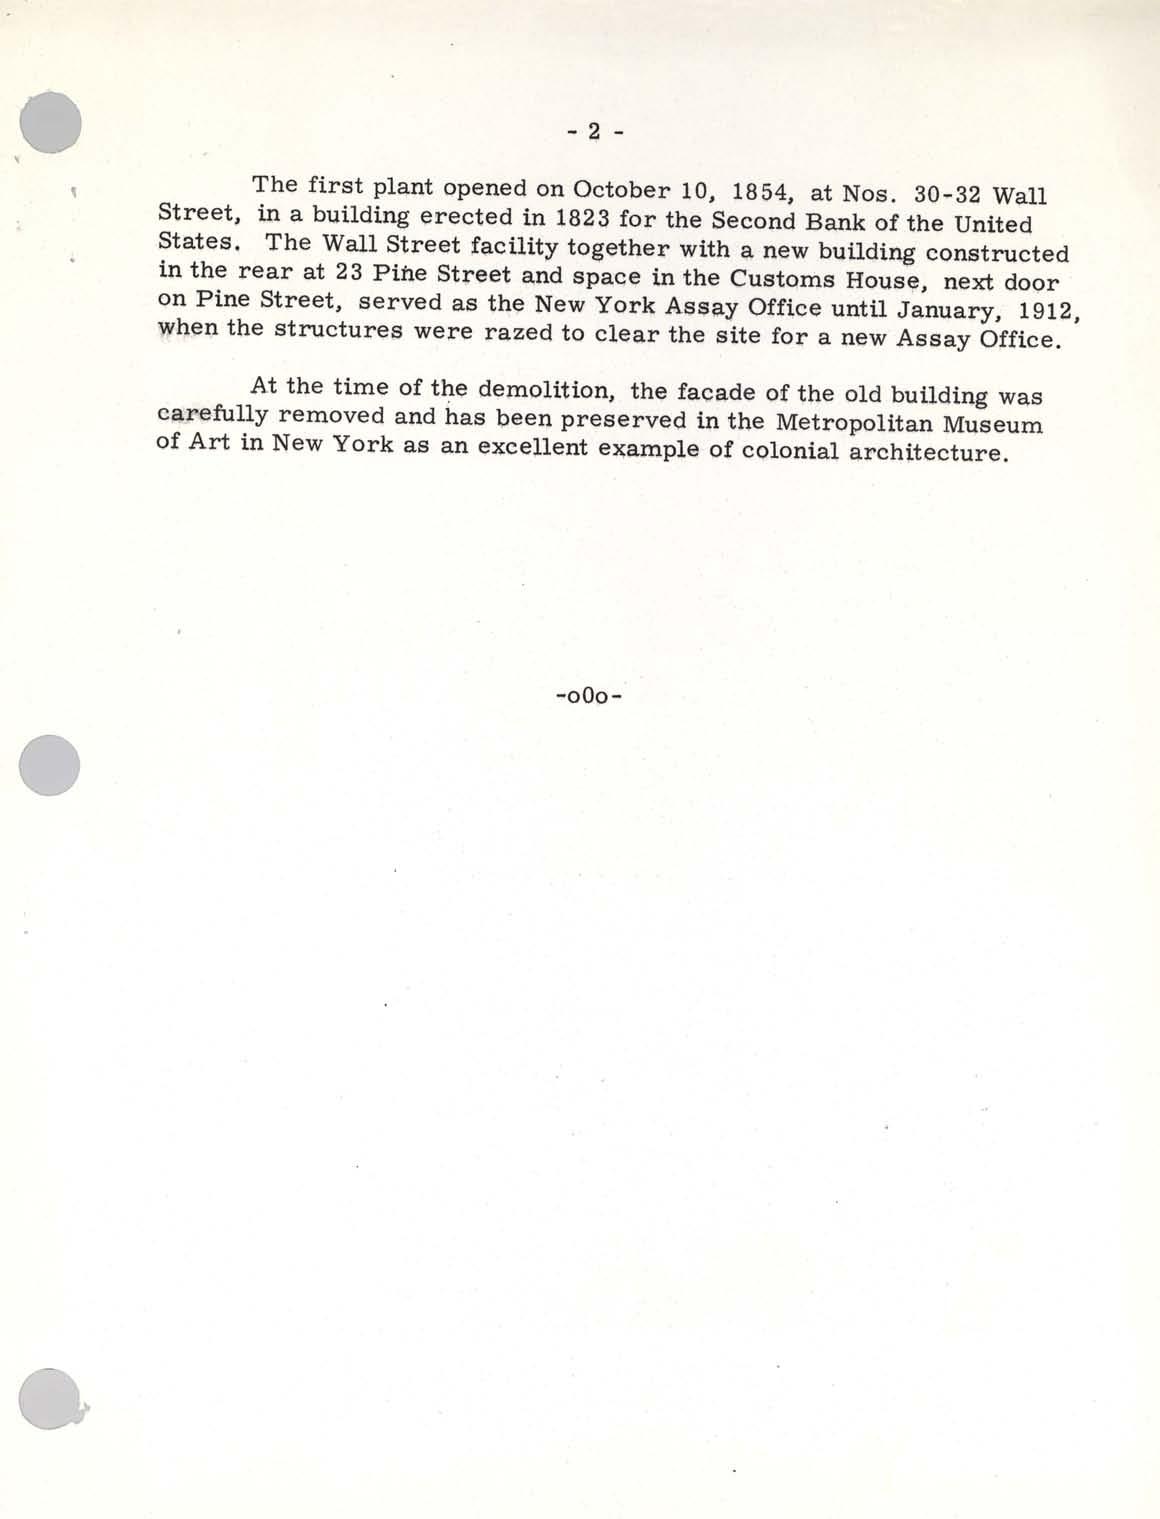 Historic Press Release: NY Assay Office Award, Page 2